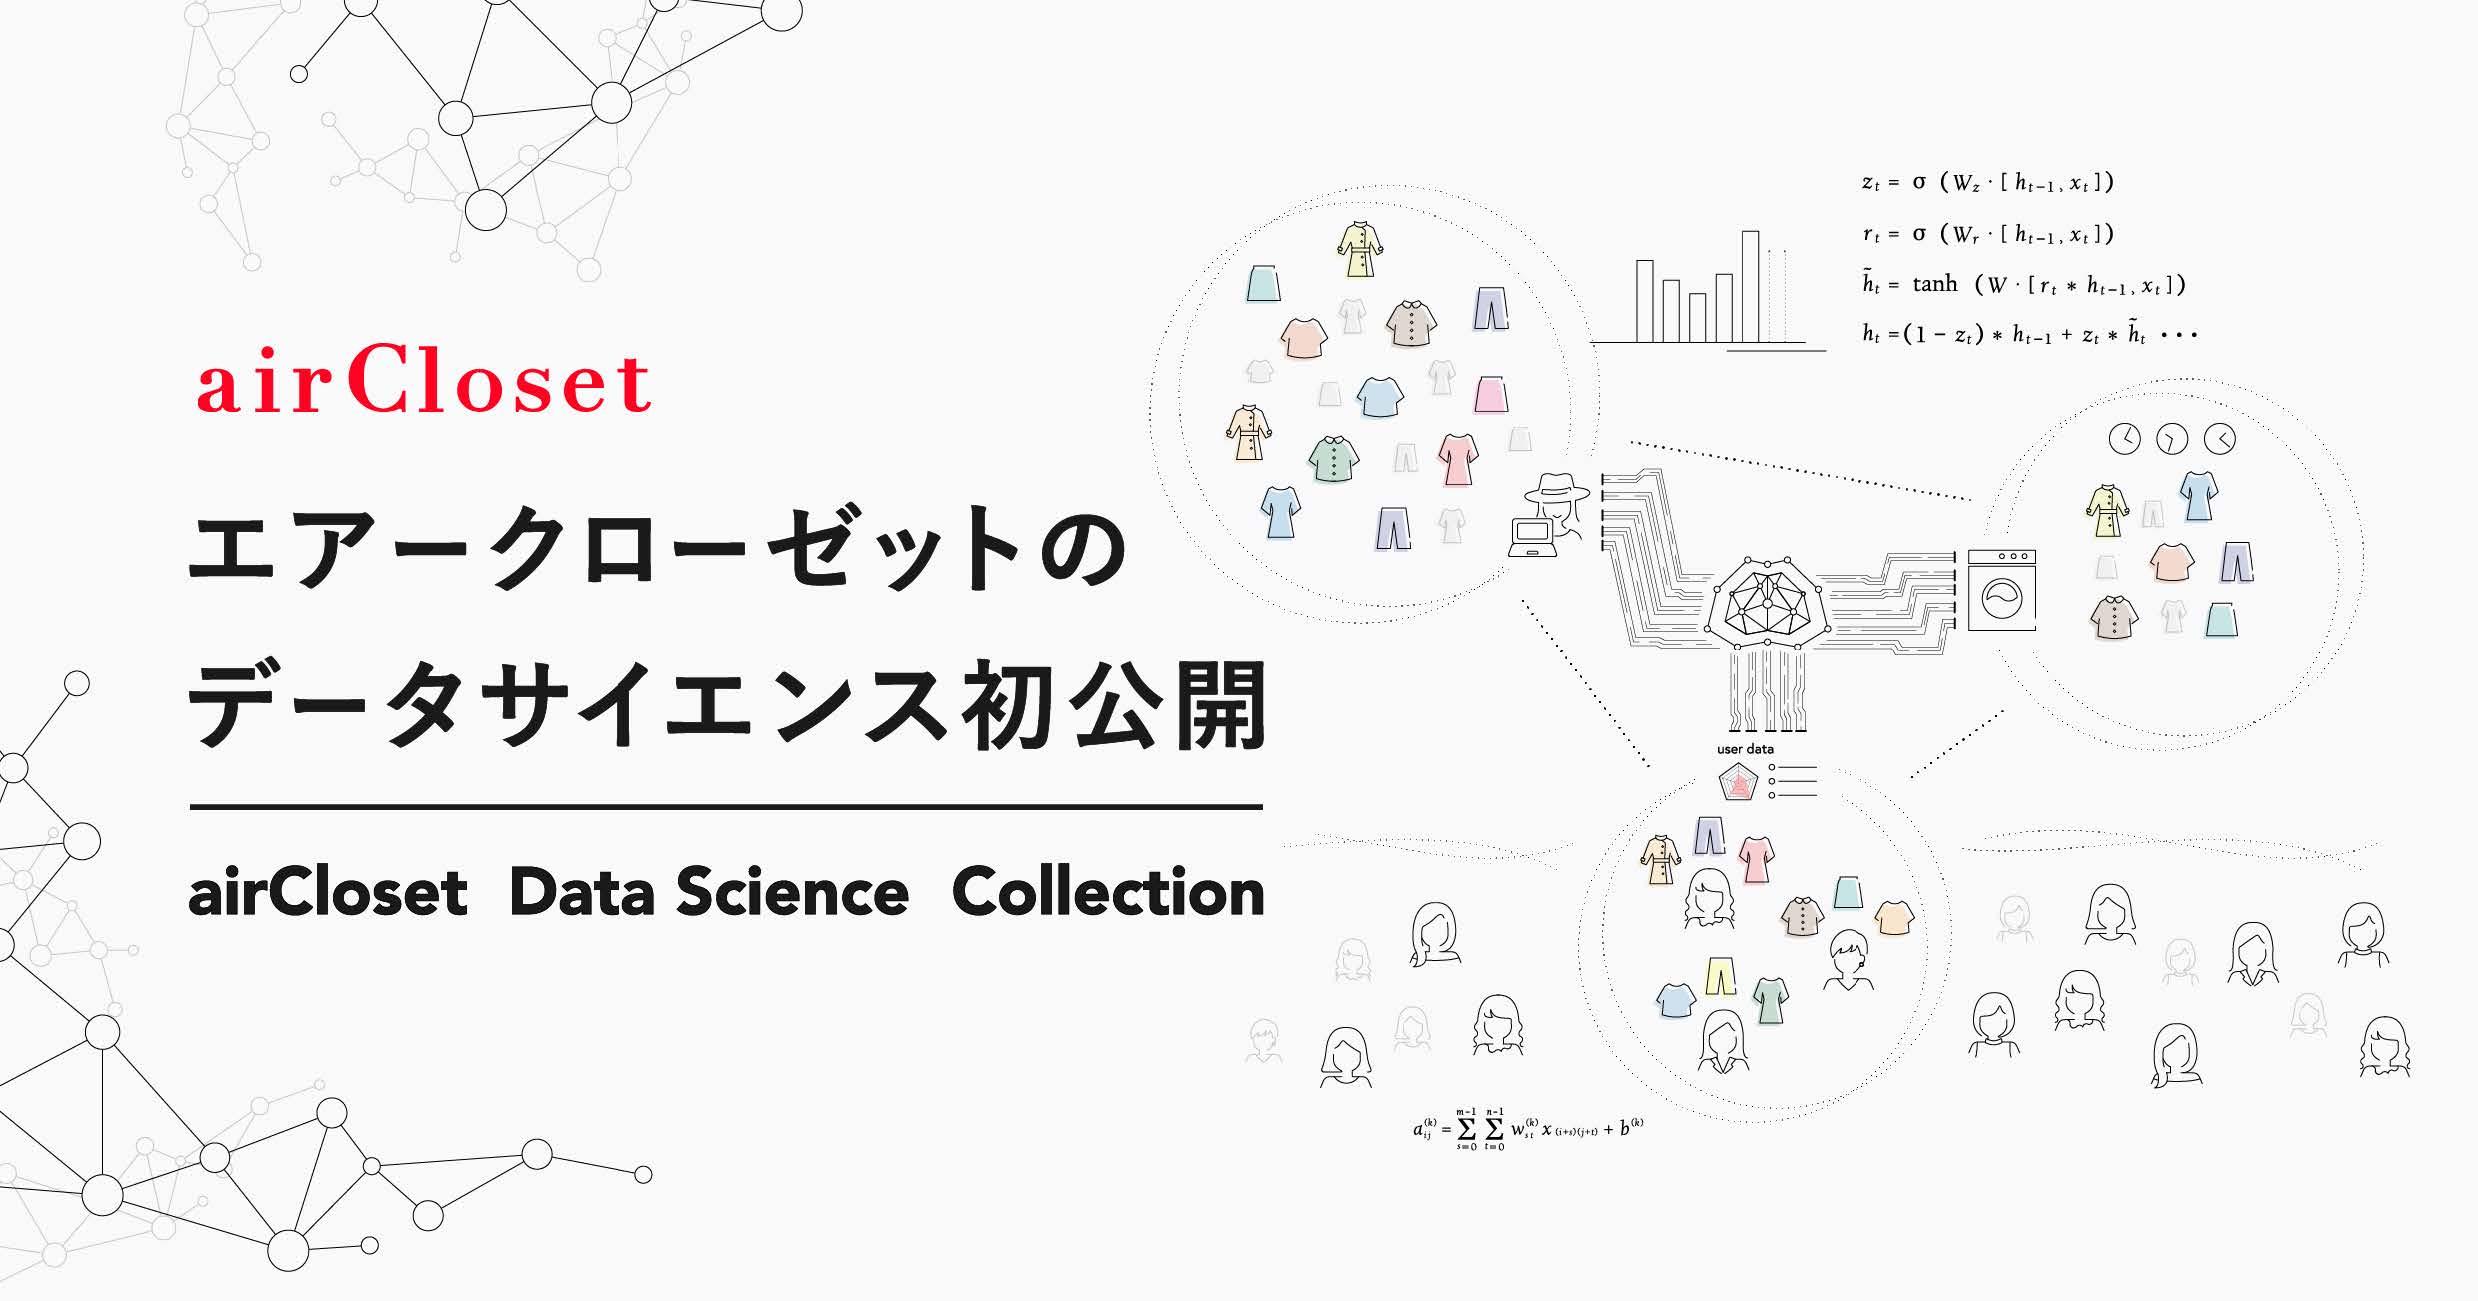 airCloset Data Sciense Collection